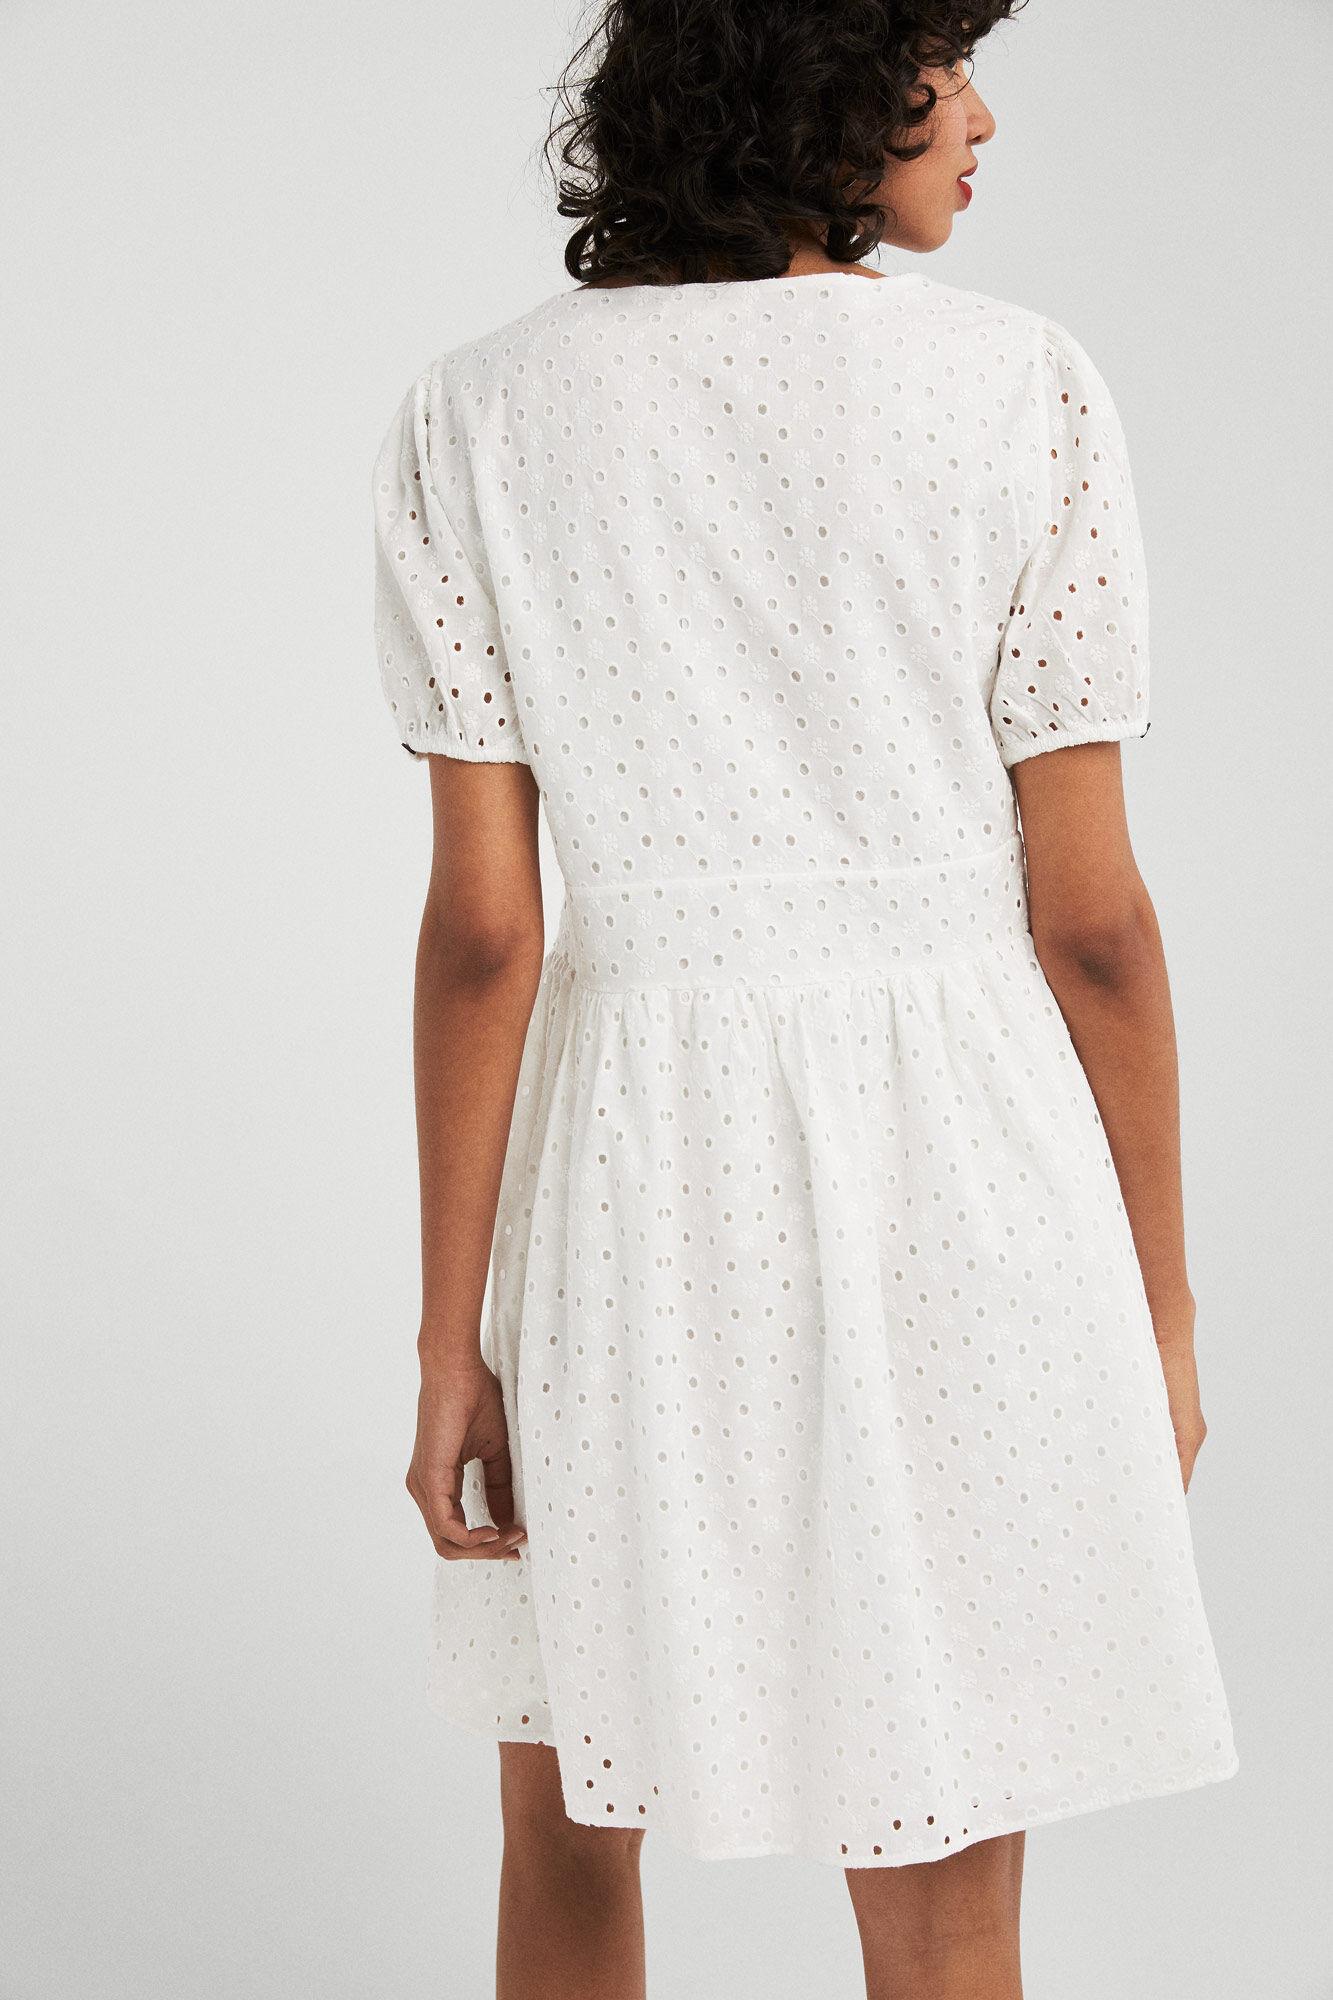 8fae9c6d24 Swiss embroidery dress